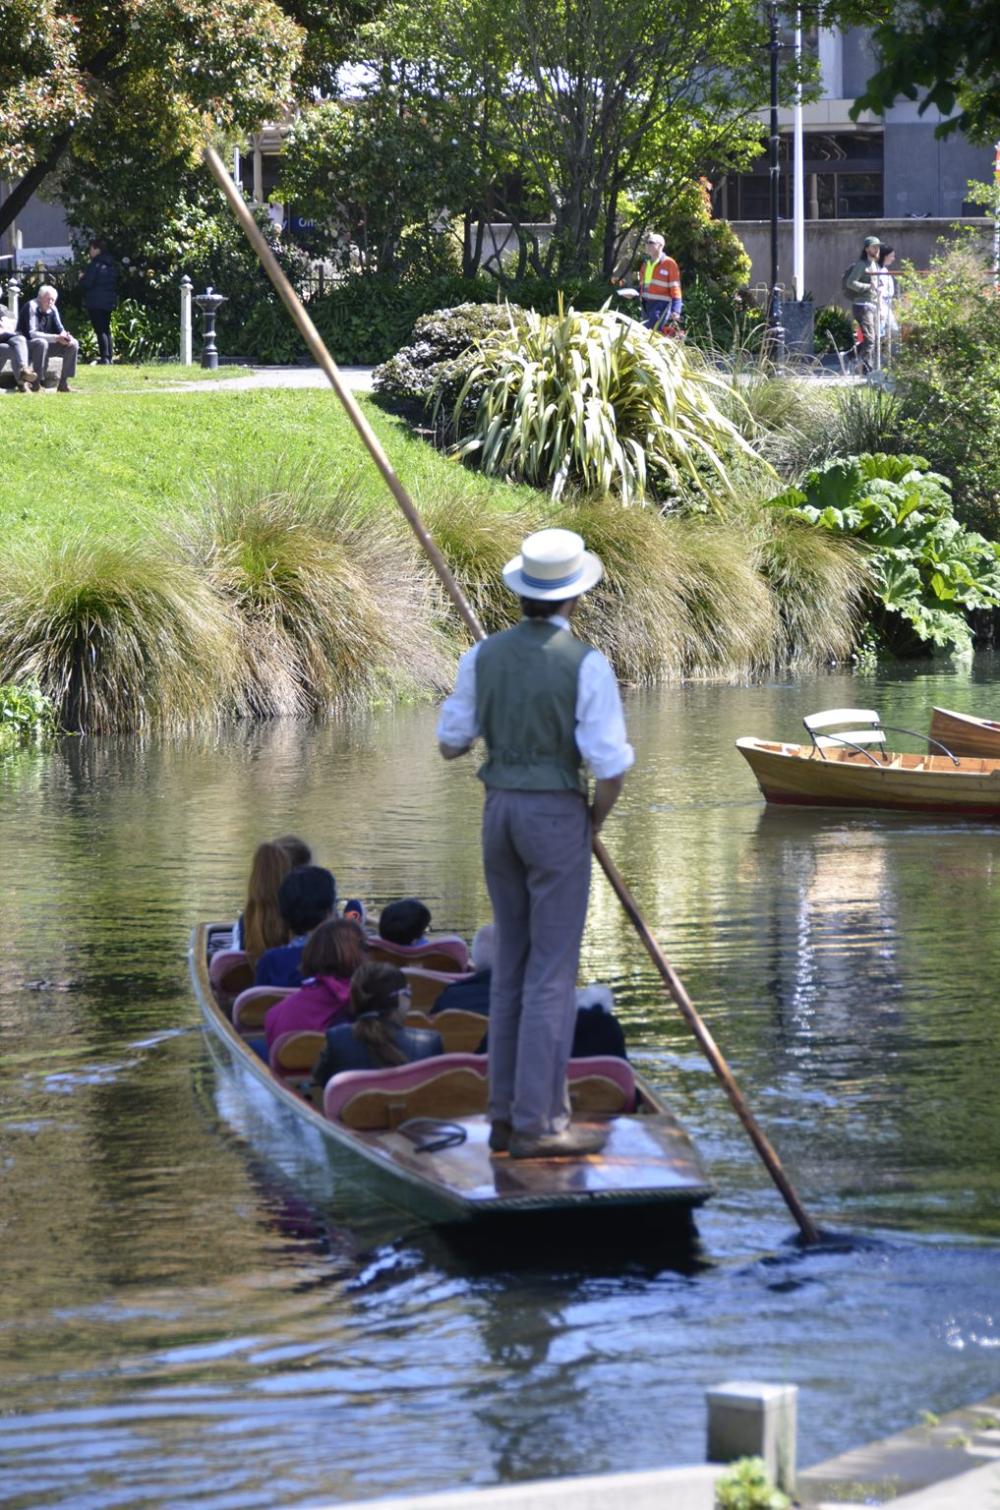 New Zealand. image by Katriina Peltomaa in 2020